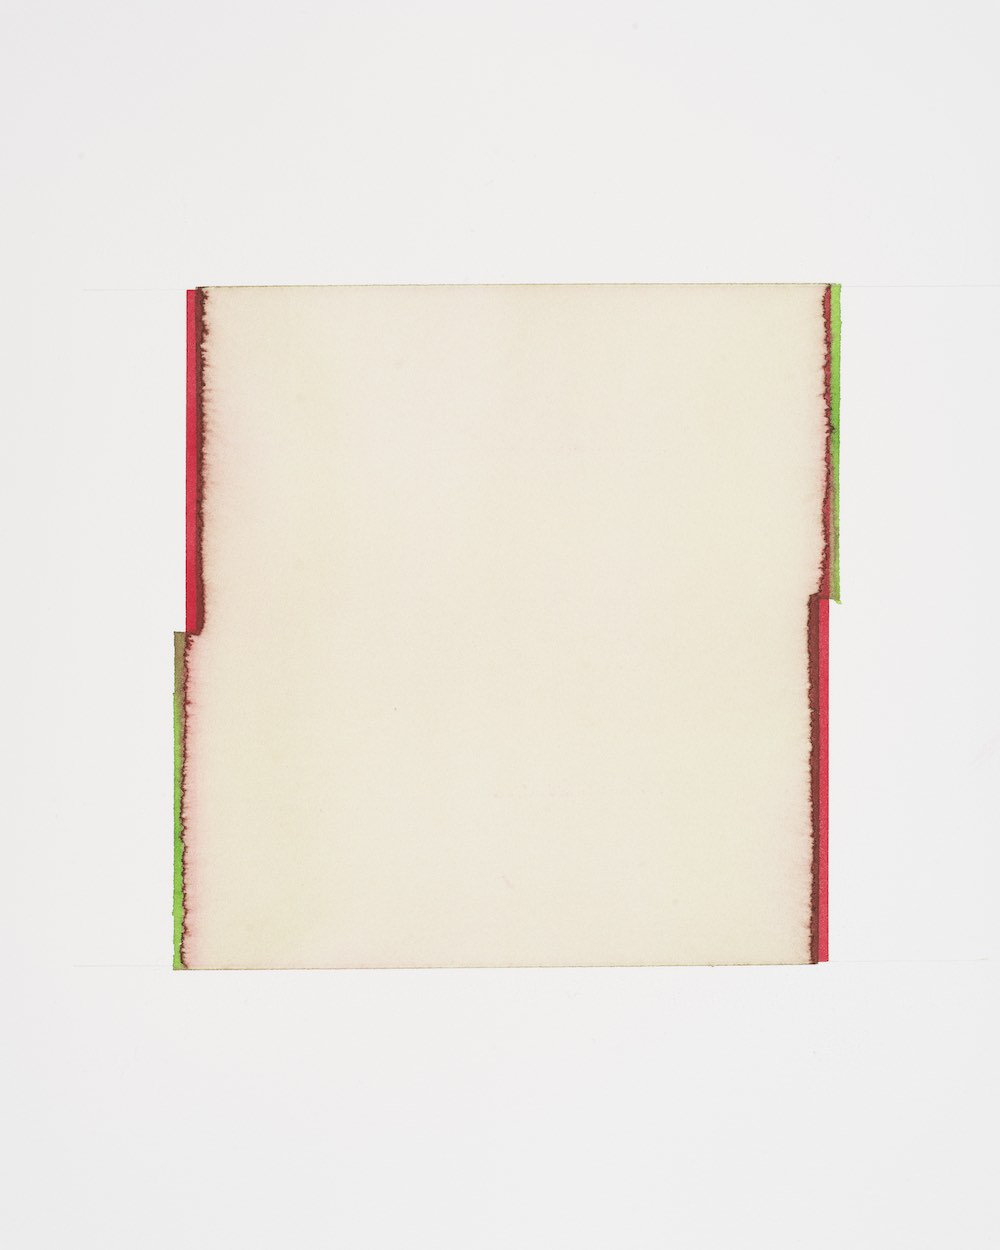 Callum Innes, Ruby Red, Sap Green, Prix Guerlain 2020